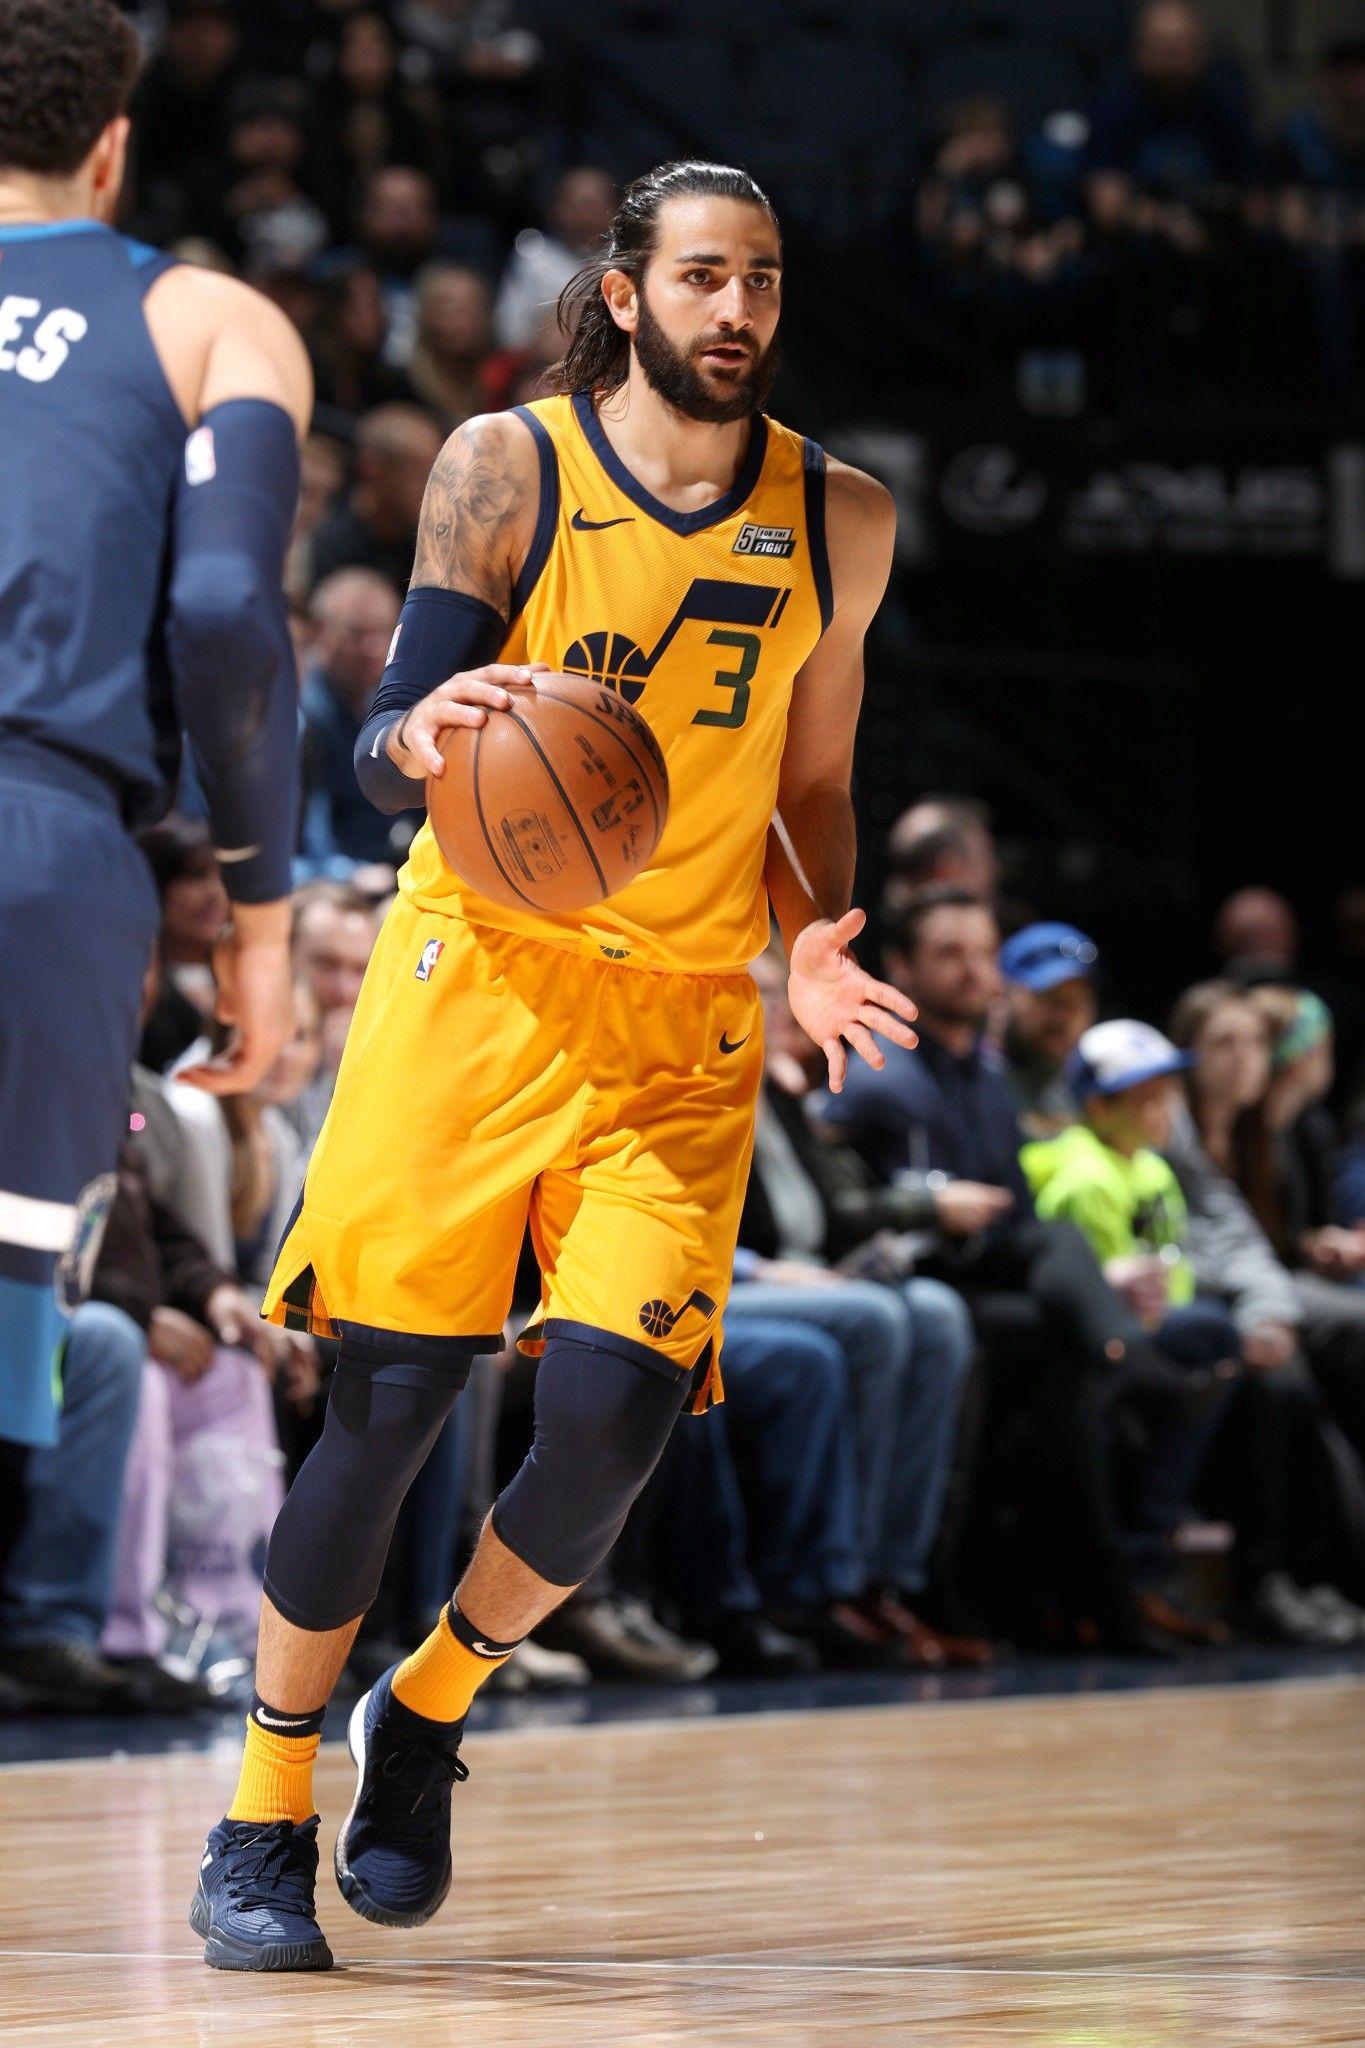 Pin By Ball Is Life On Nba Basketball Workouts Best Basketball Shoes Utah Jazz Basketball